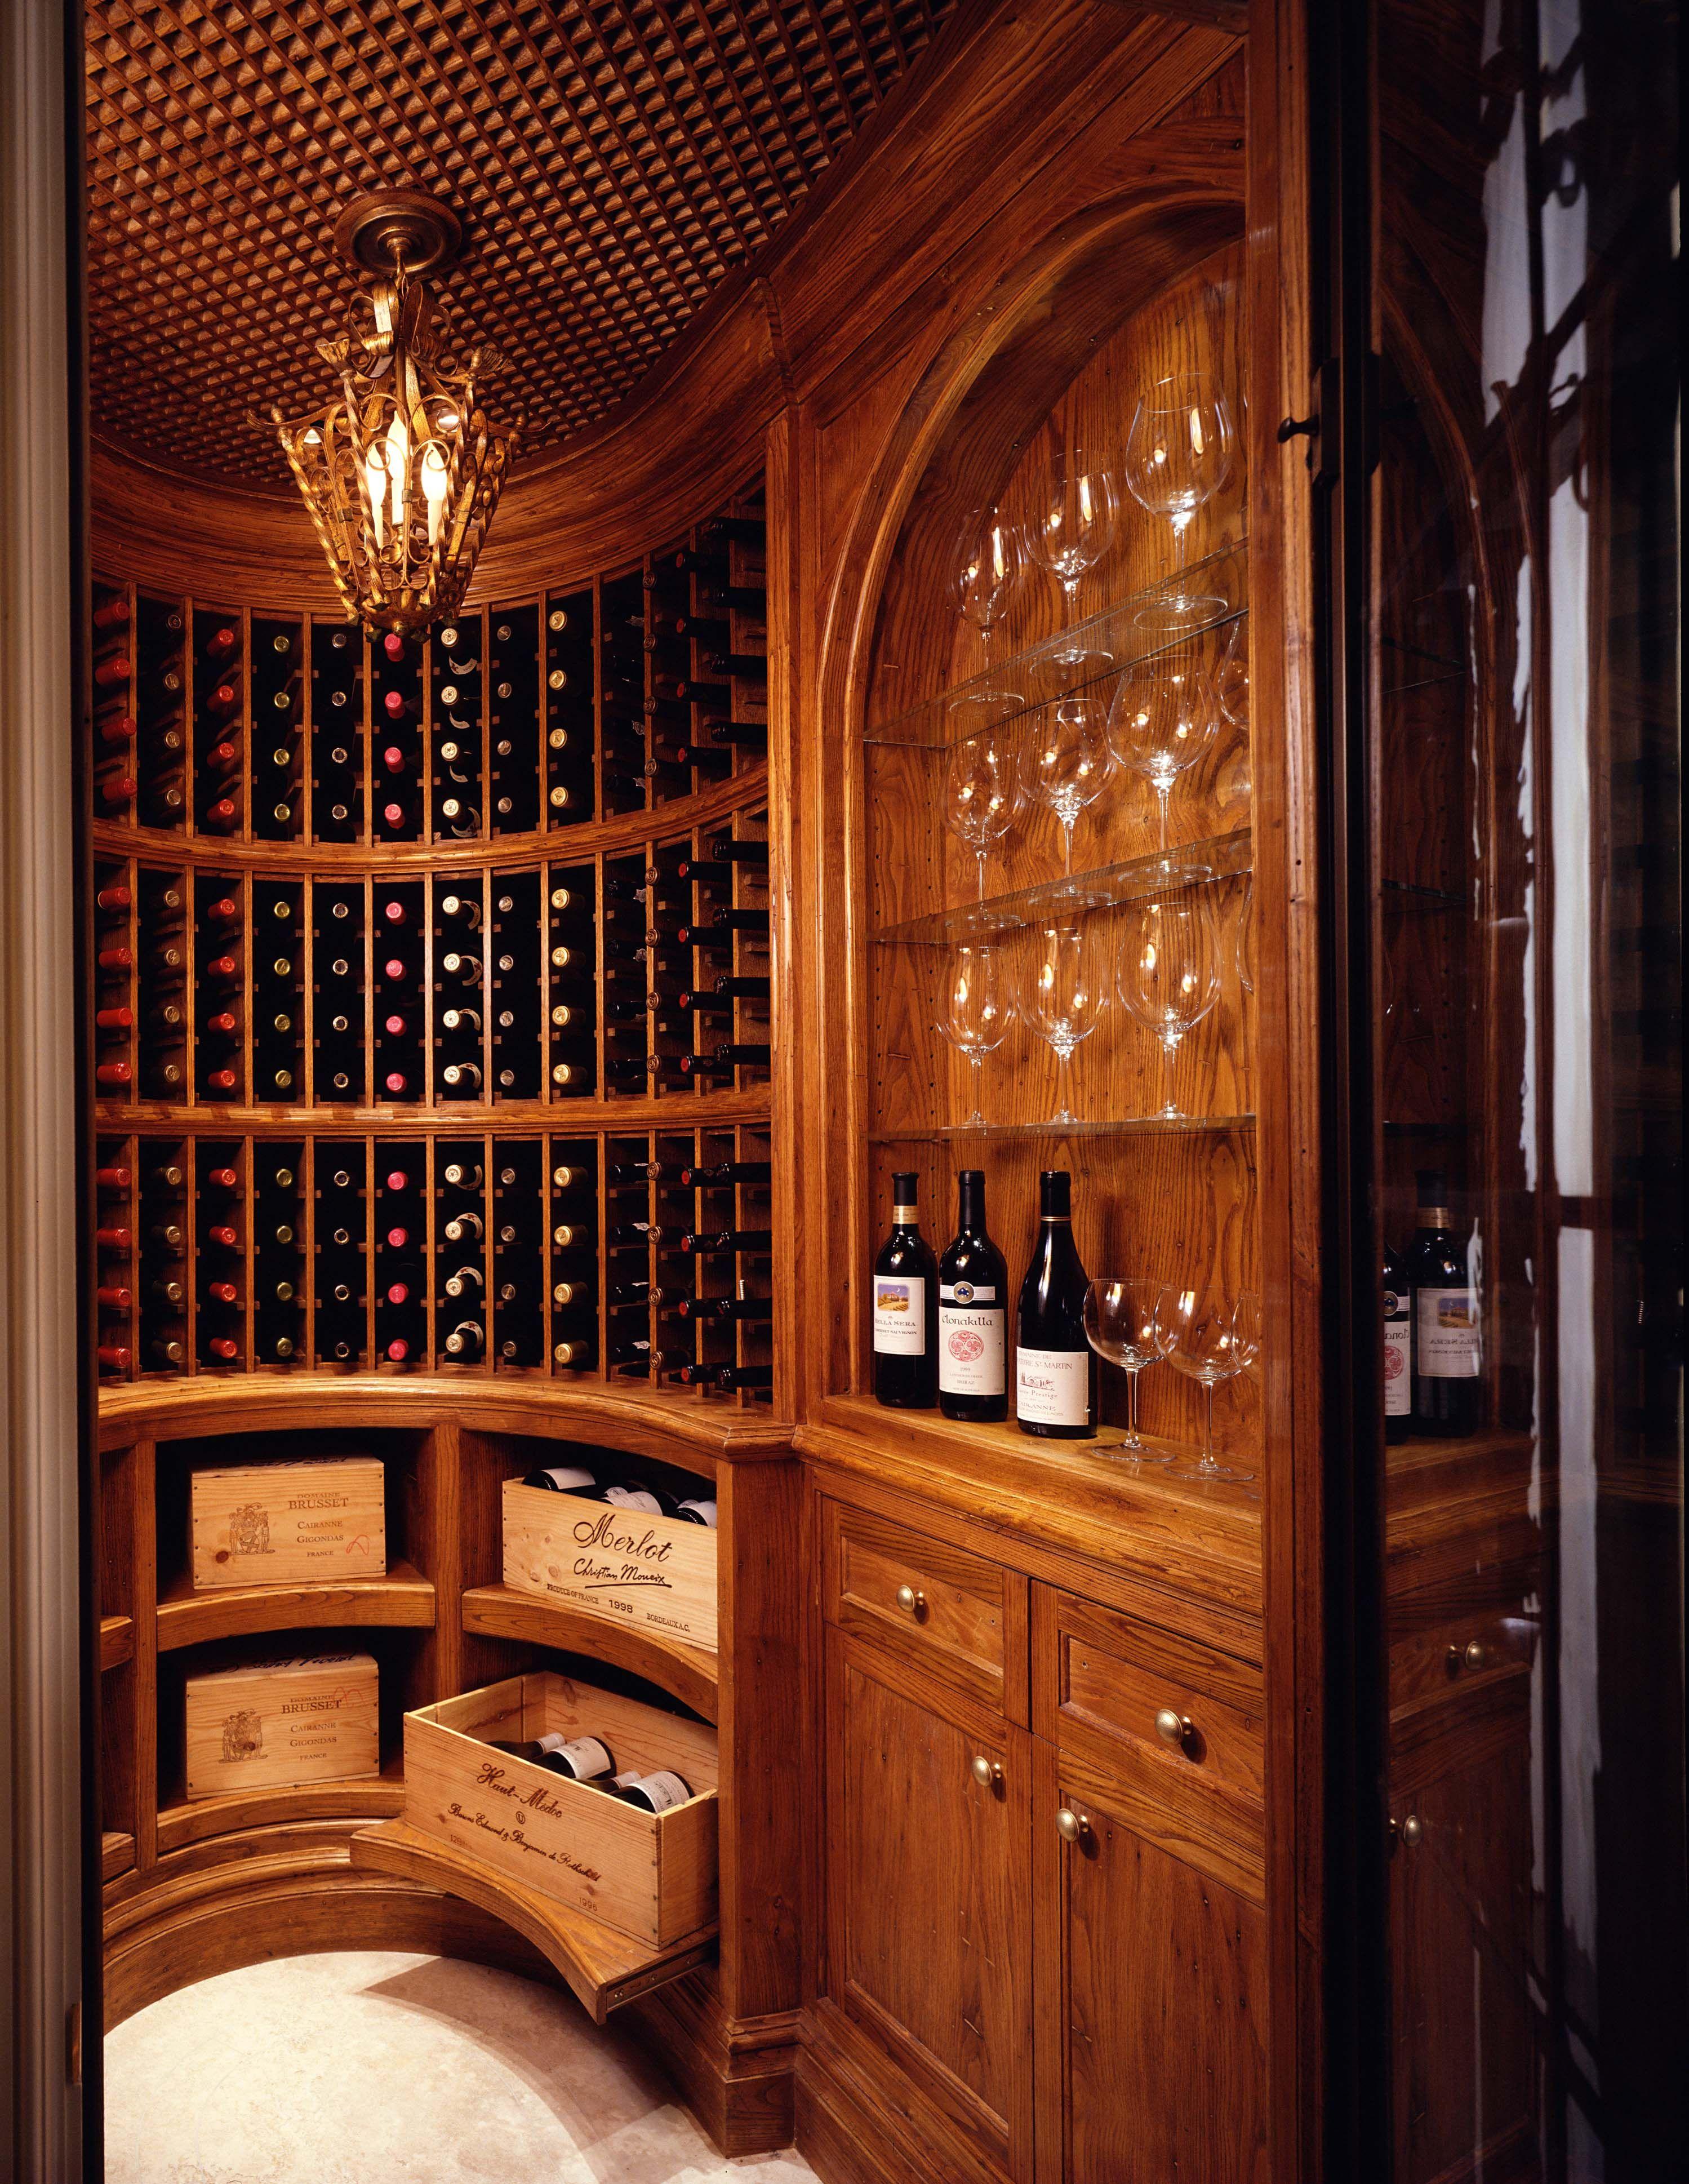 20 Glorious Contemporary Home Bar Designs You Ll Go Crazy For: Home Wine Cellars, Wine Room Design, Wine Room